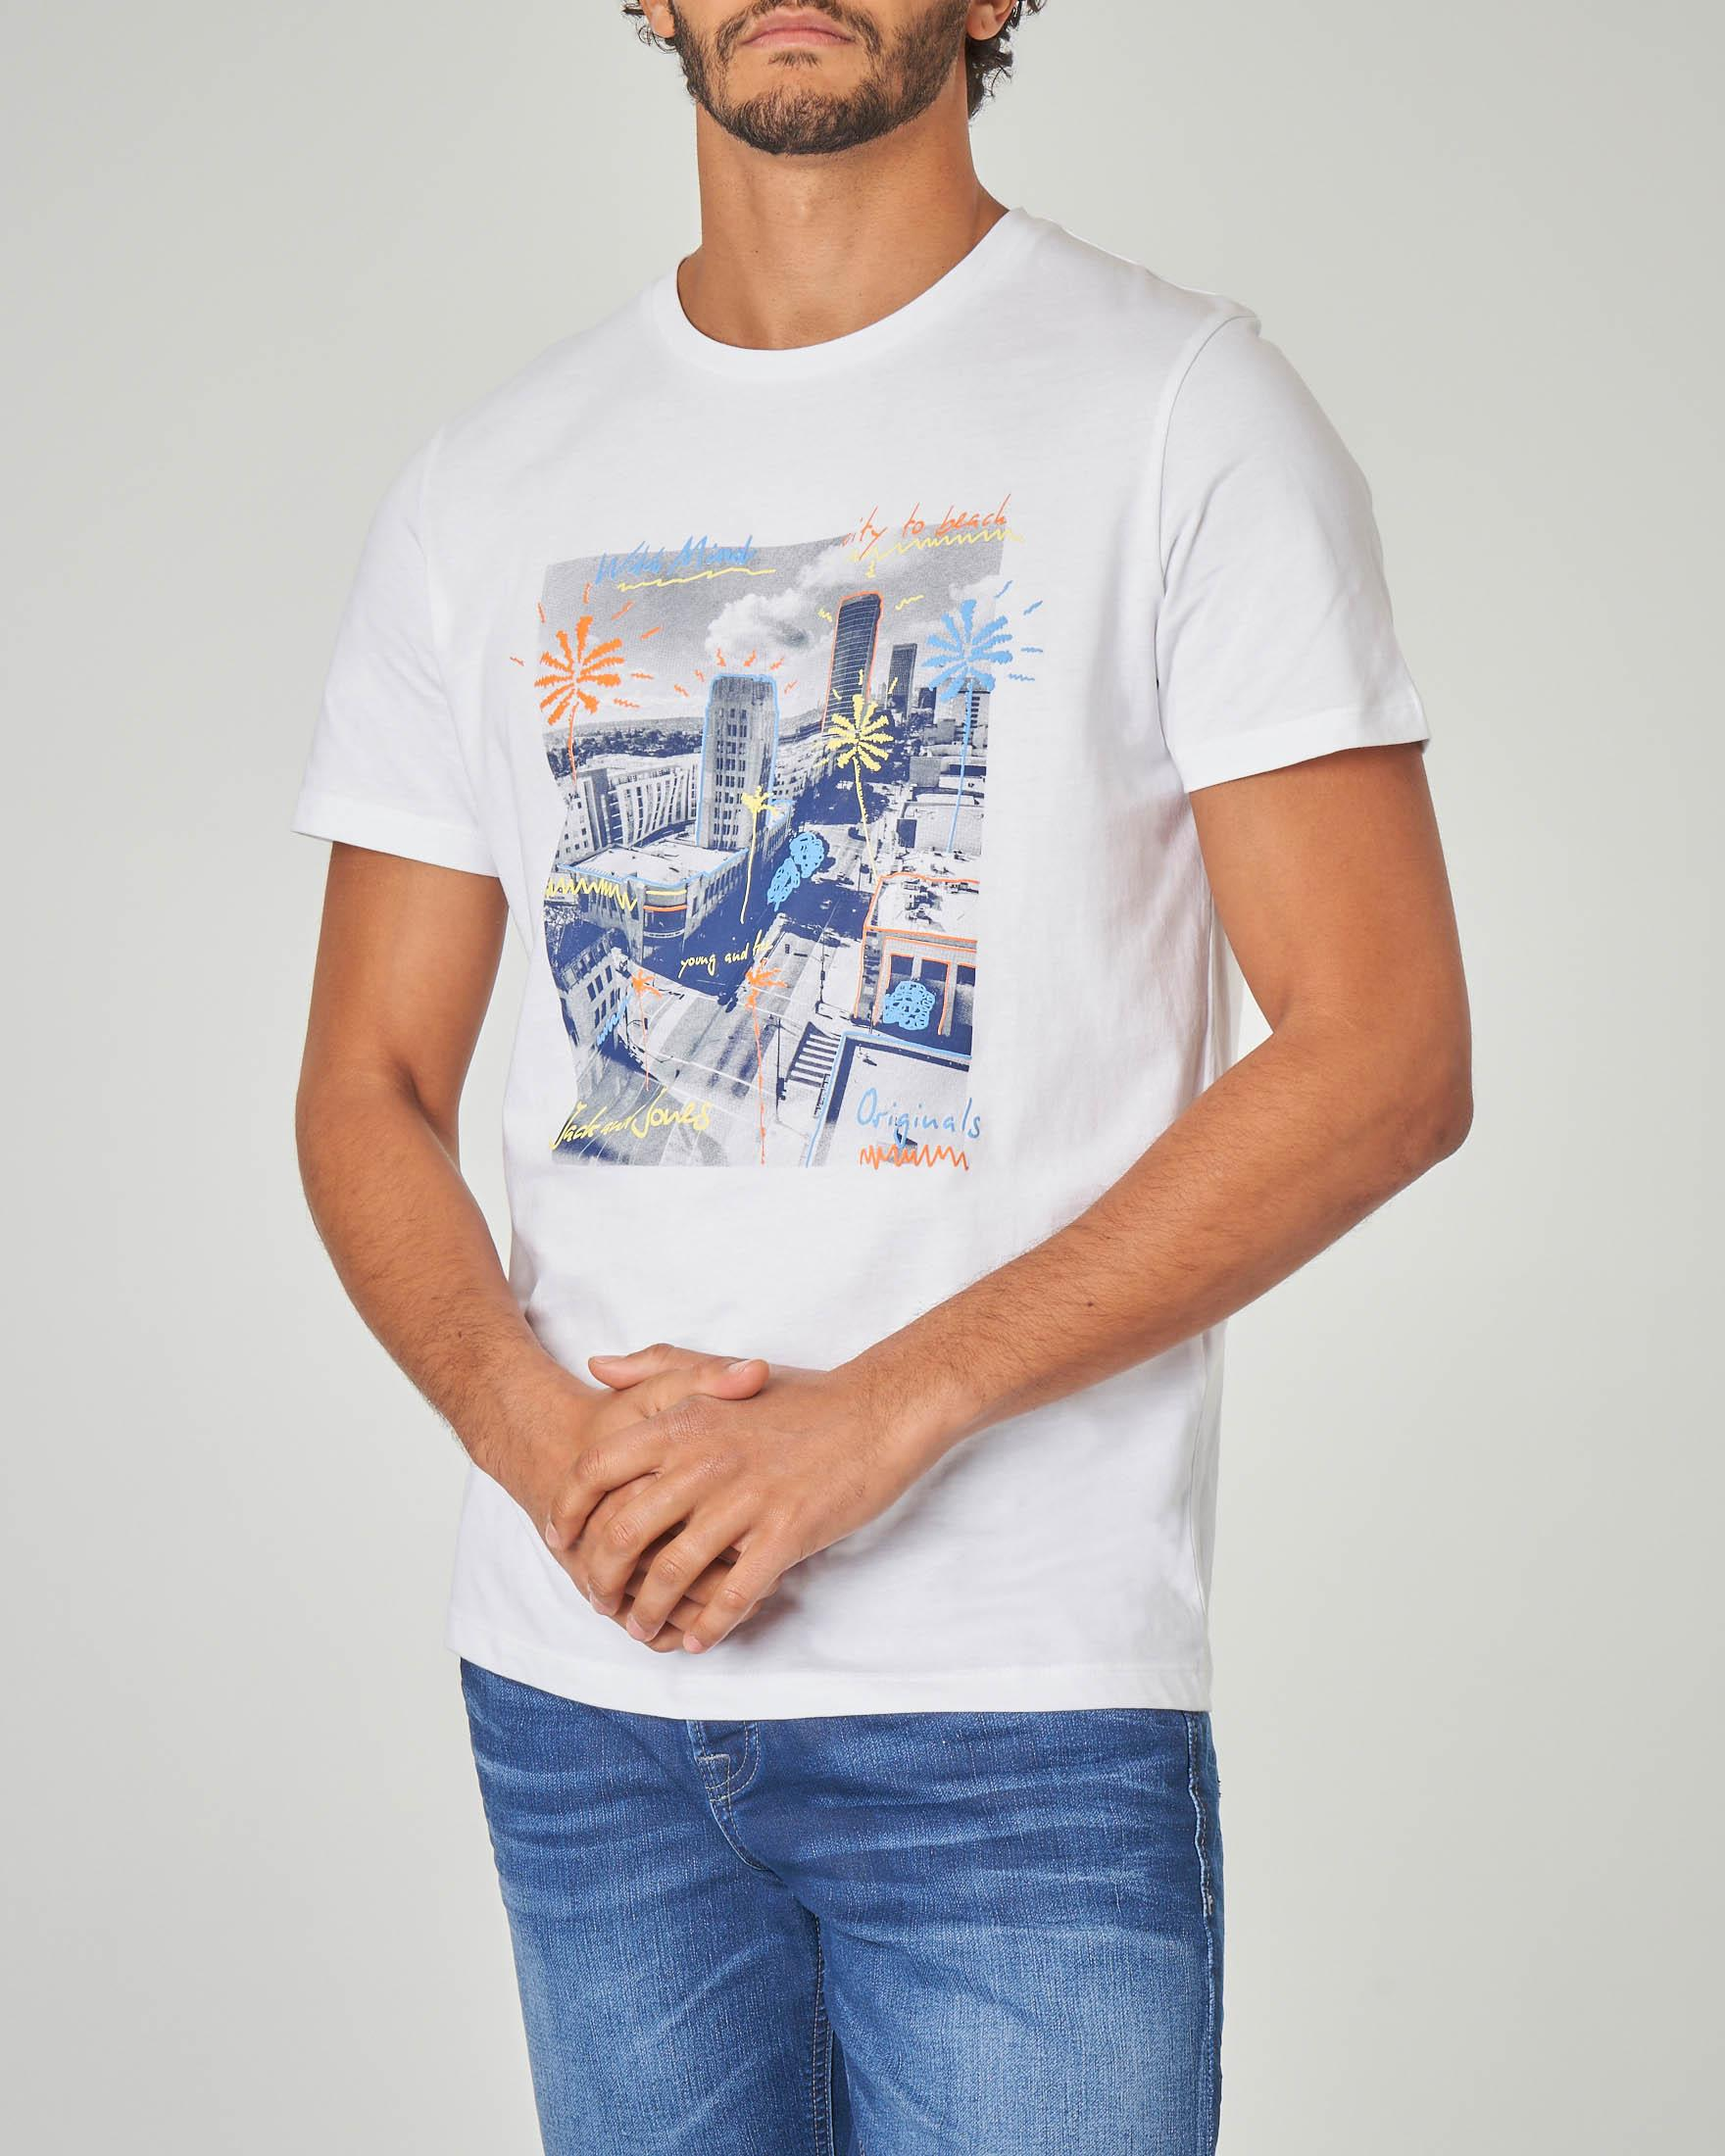 T-shirt bianca con stampa grafica